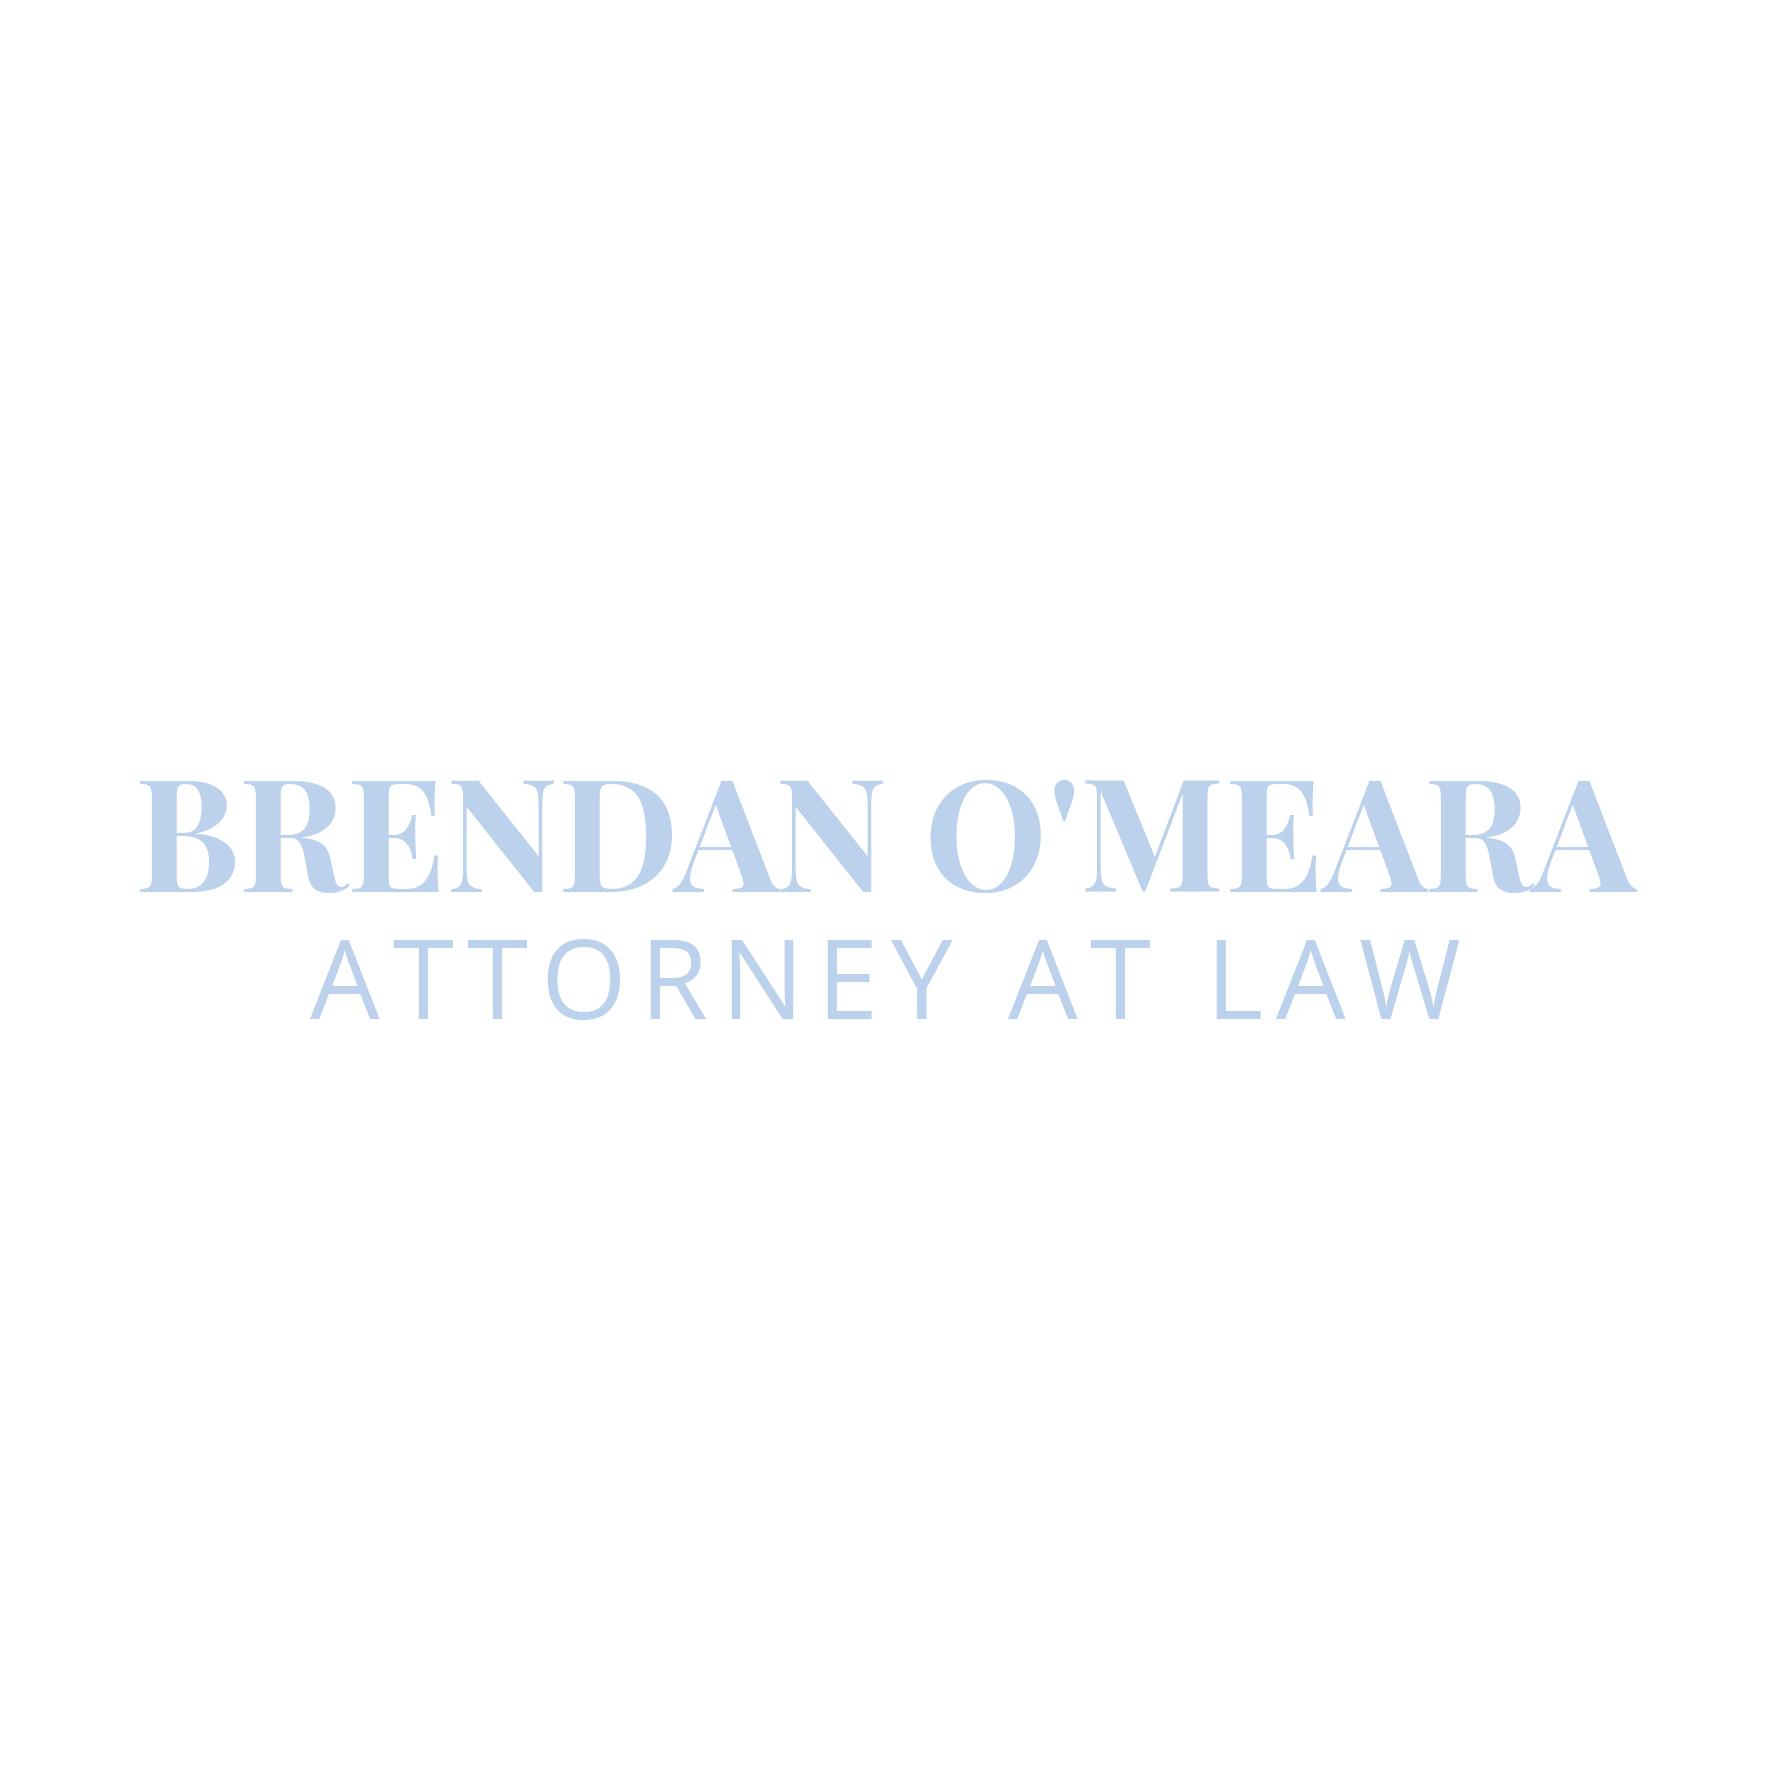 Brendan O'Meara Attorney At Law